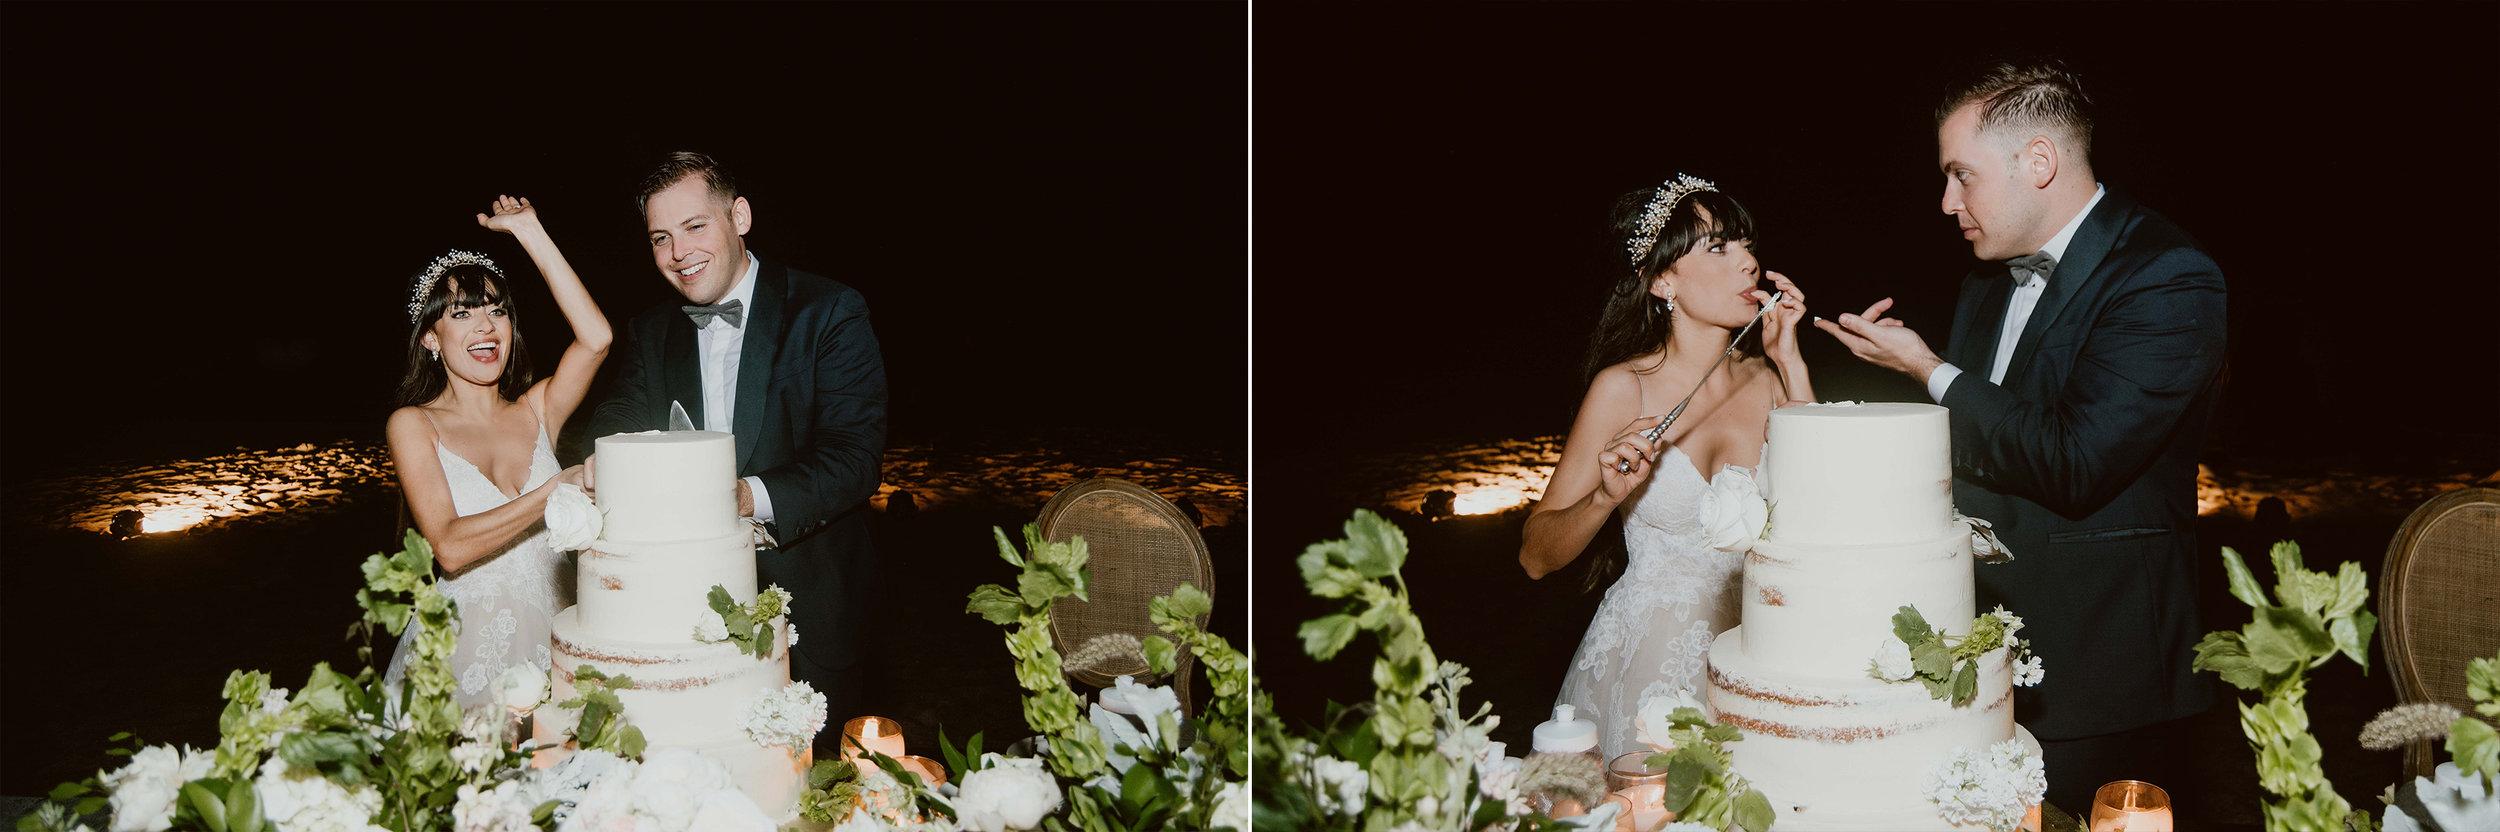 Mariana+Blake Sayulita Wedding-483-486.jpg